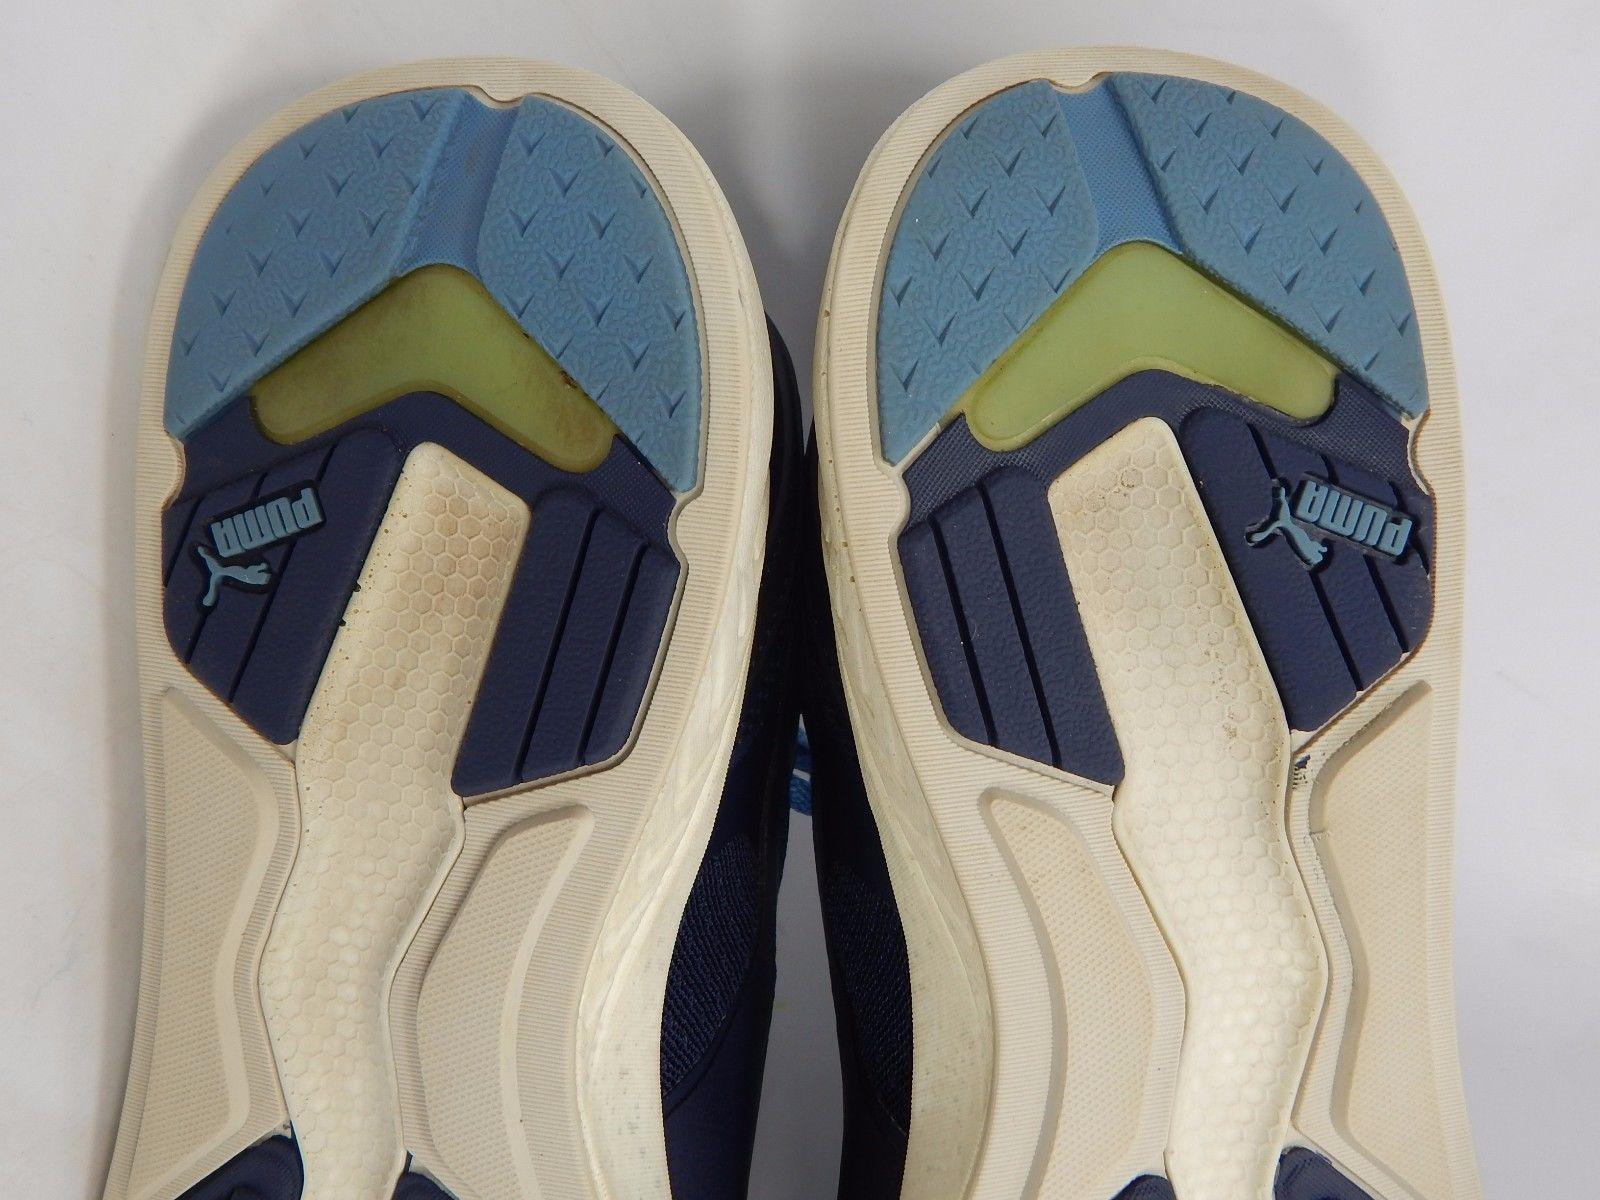 Puma 698 Ignite Men's Athletic Running Shoes Size US 11 M (D) EU 44.5 White Blue